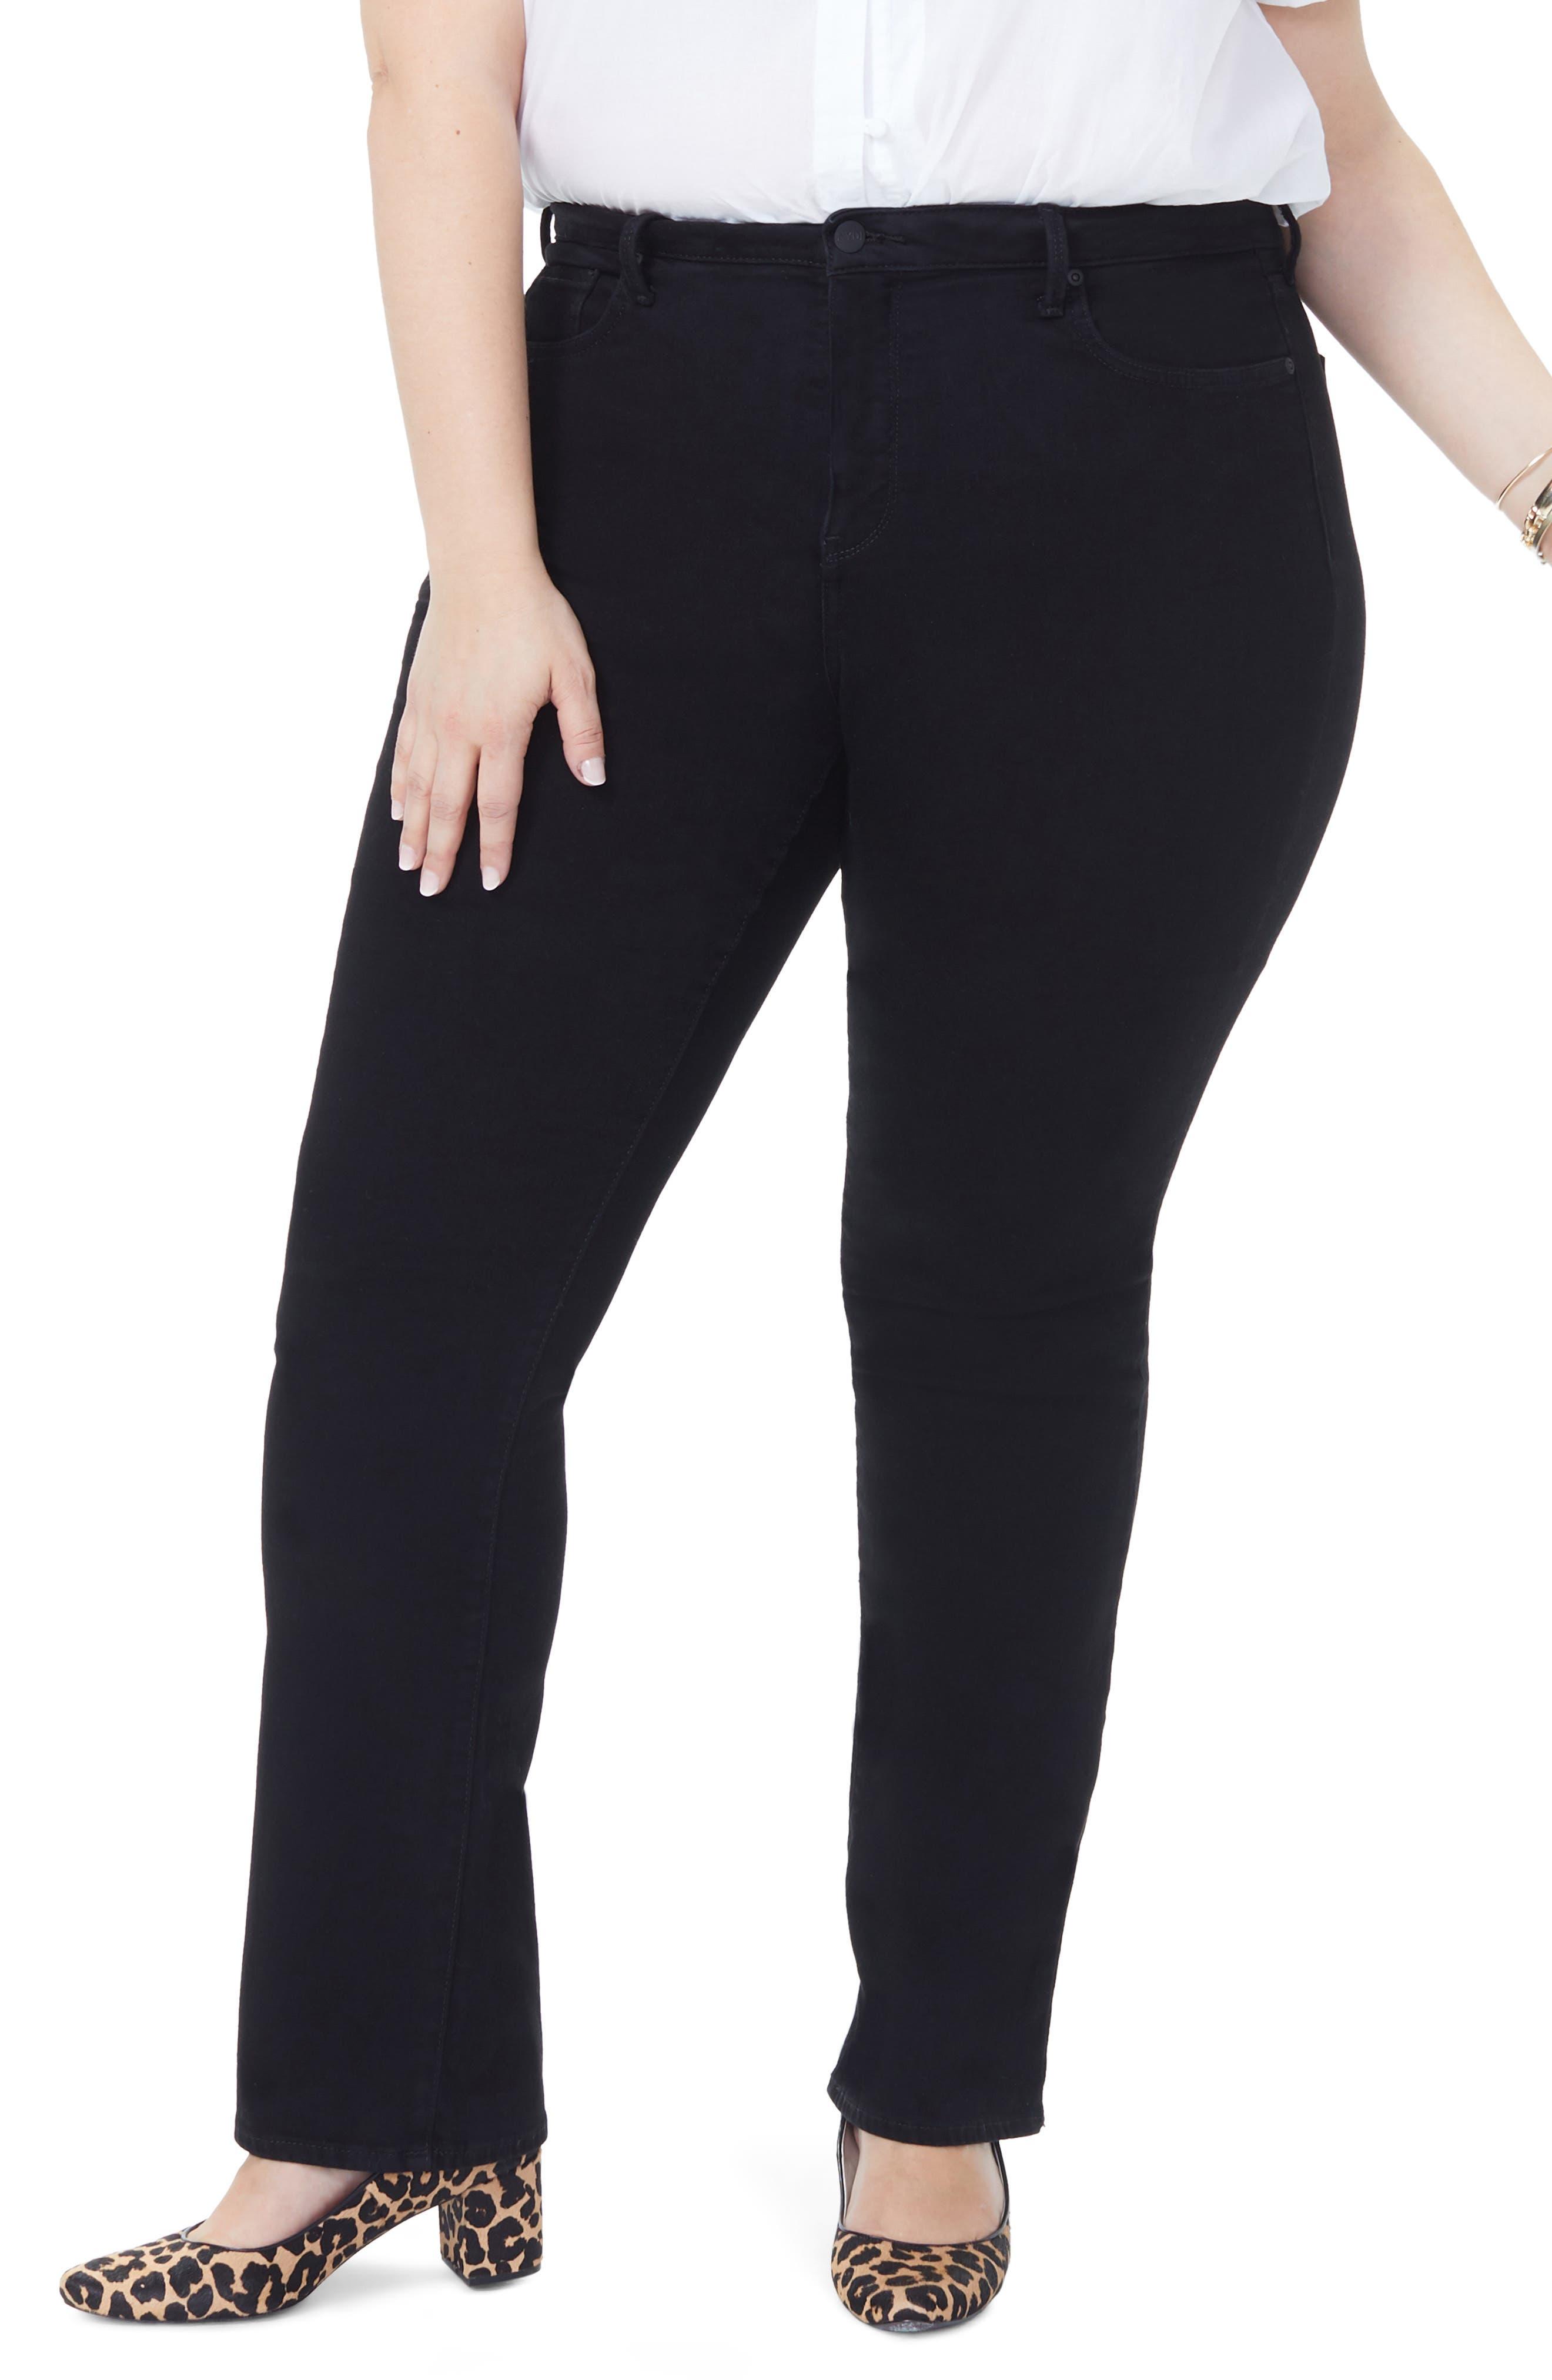 NYDJ, Barbara High Rise Bootcut Jeans, Main thumbnail 1, color, BLACK